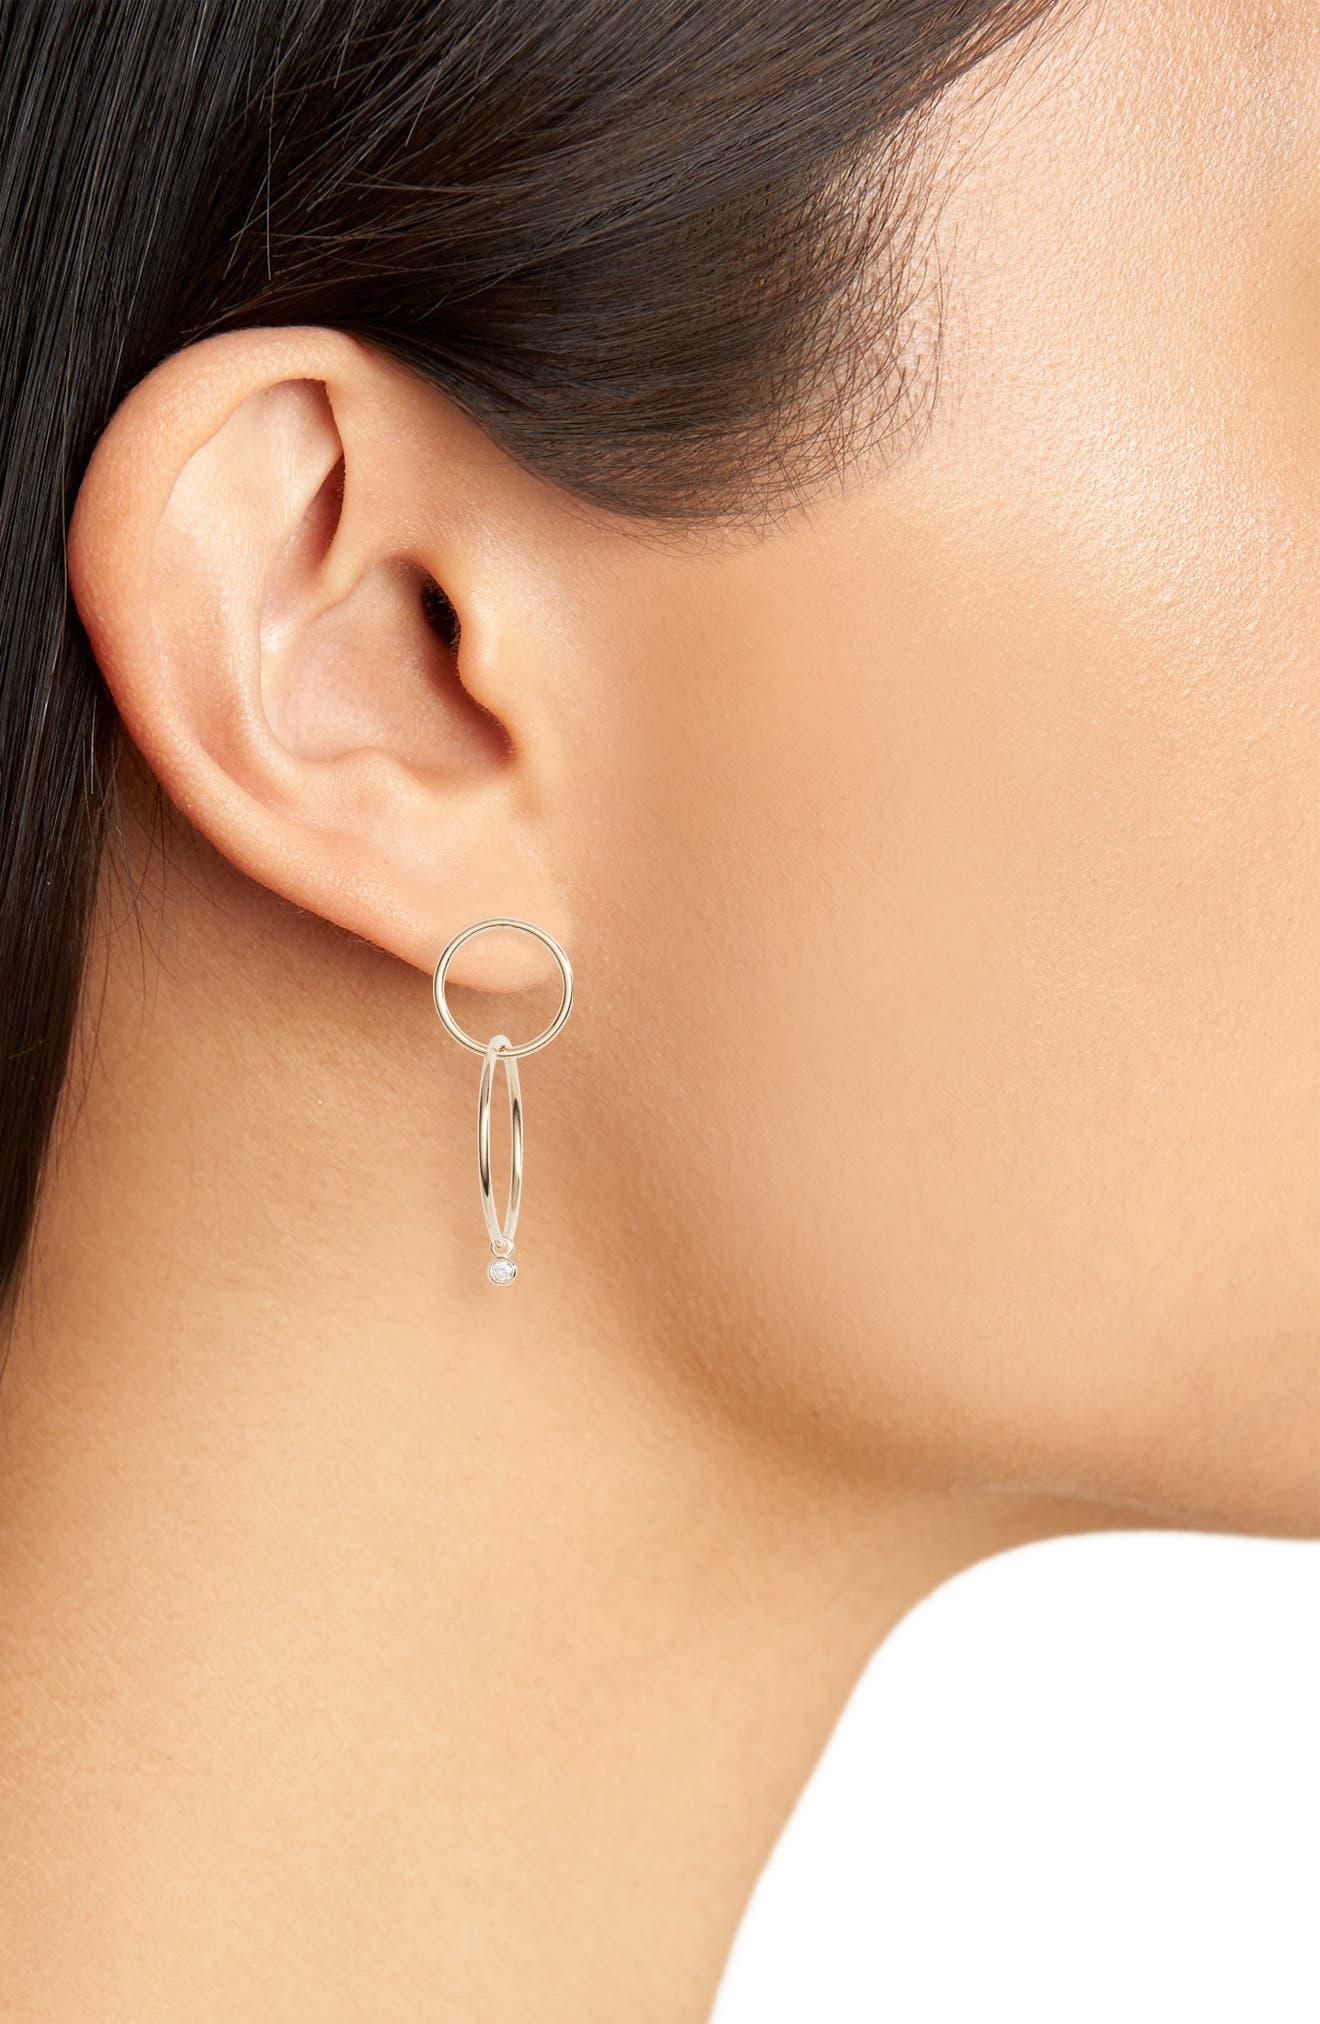 Double Star Diamond Drop Earrings,                             Alternate thumbnail 2, color,                             YELLOW GOLD